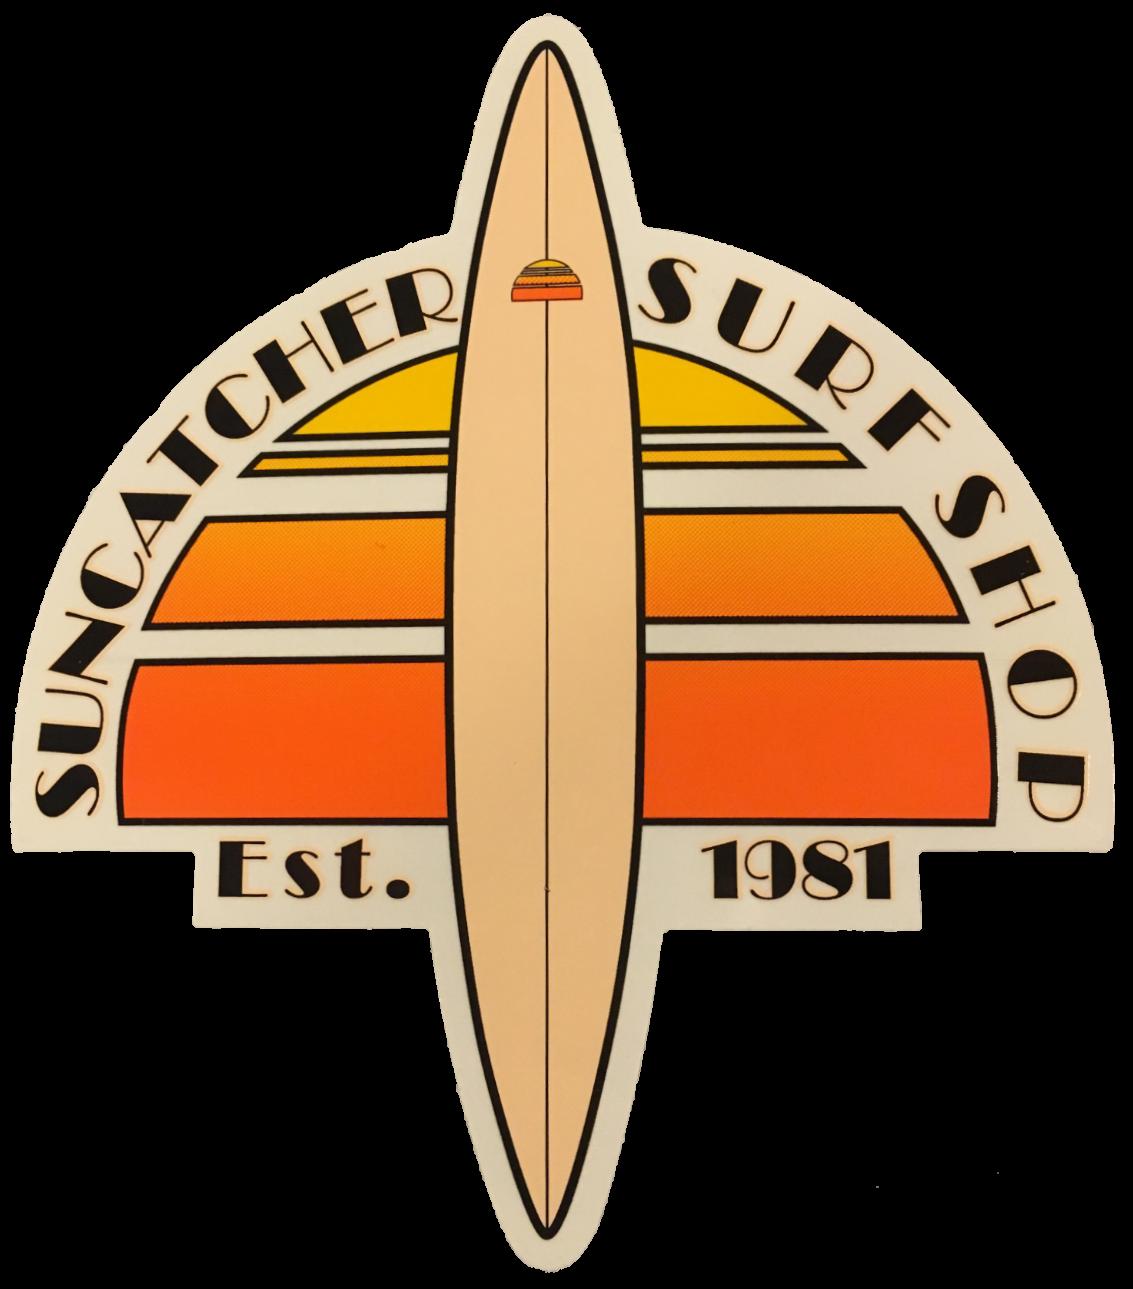 Suncatcher Surf Shop and Mimi's Shop in Stone Harbor